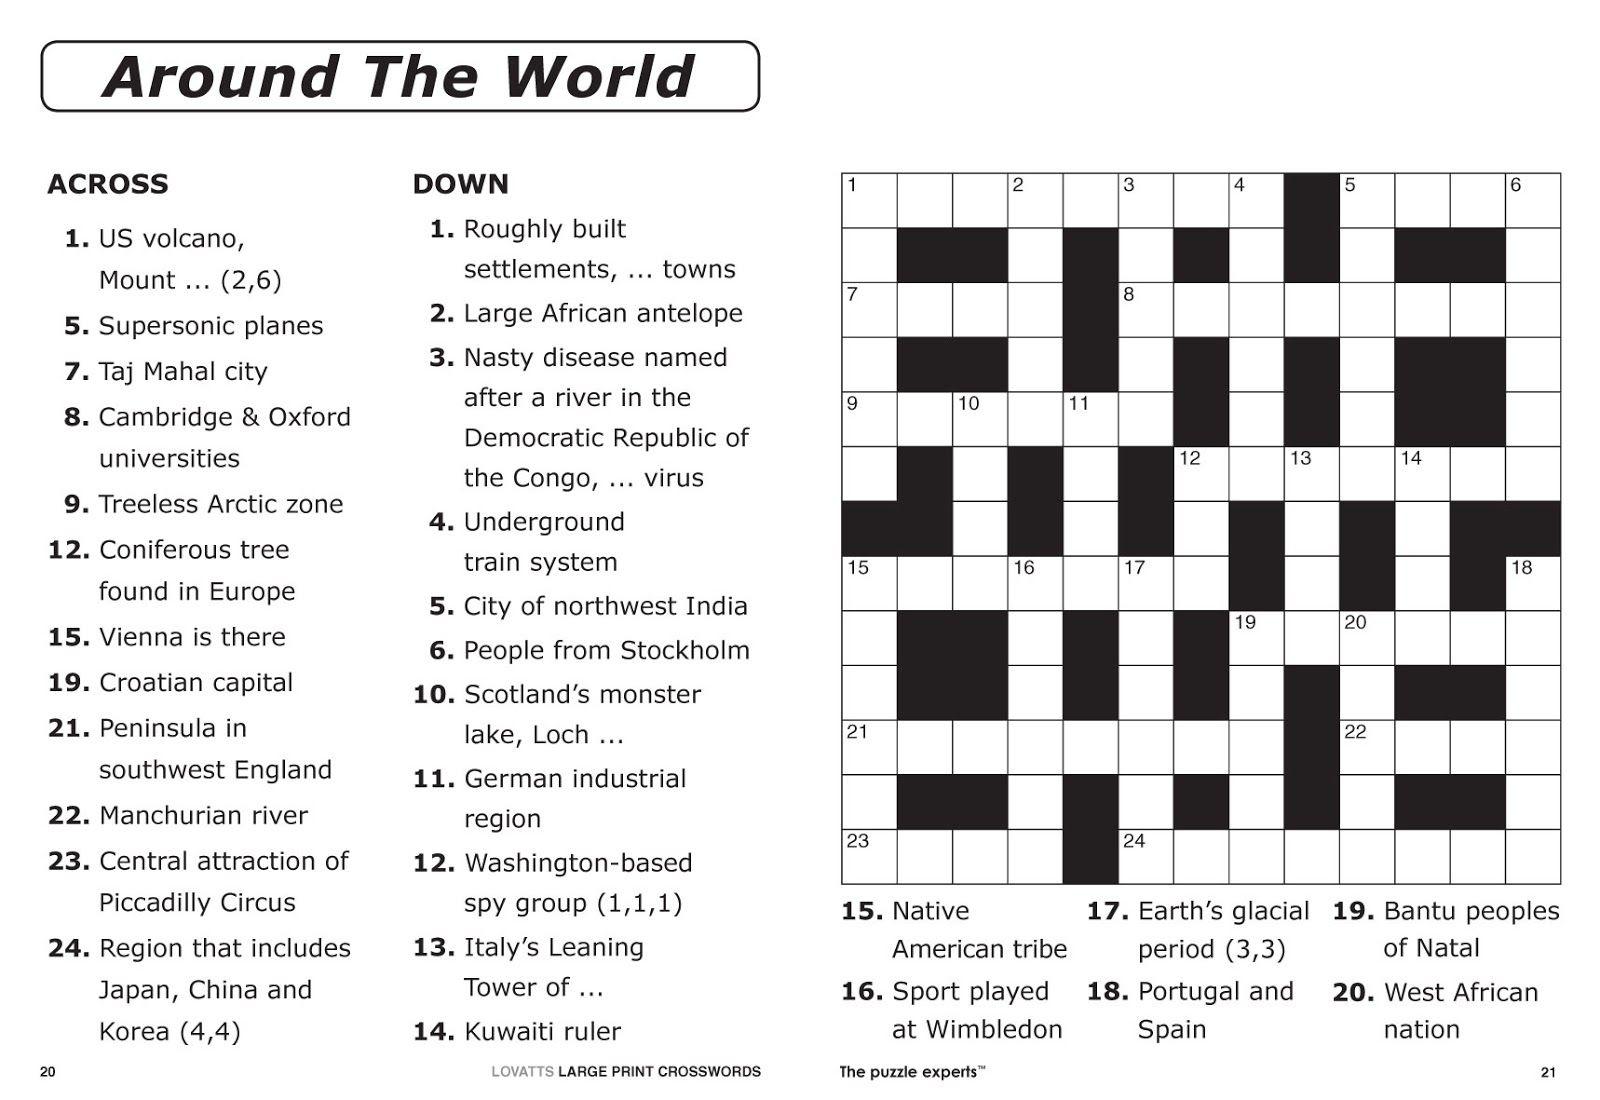 Free Printable Large Print Crossword Puzzles | M3U8 - Large Print Crossword Puzzles Pdf